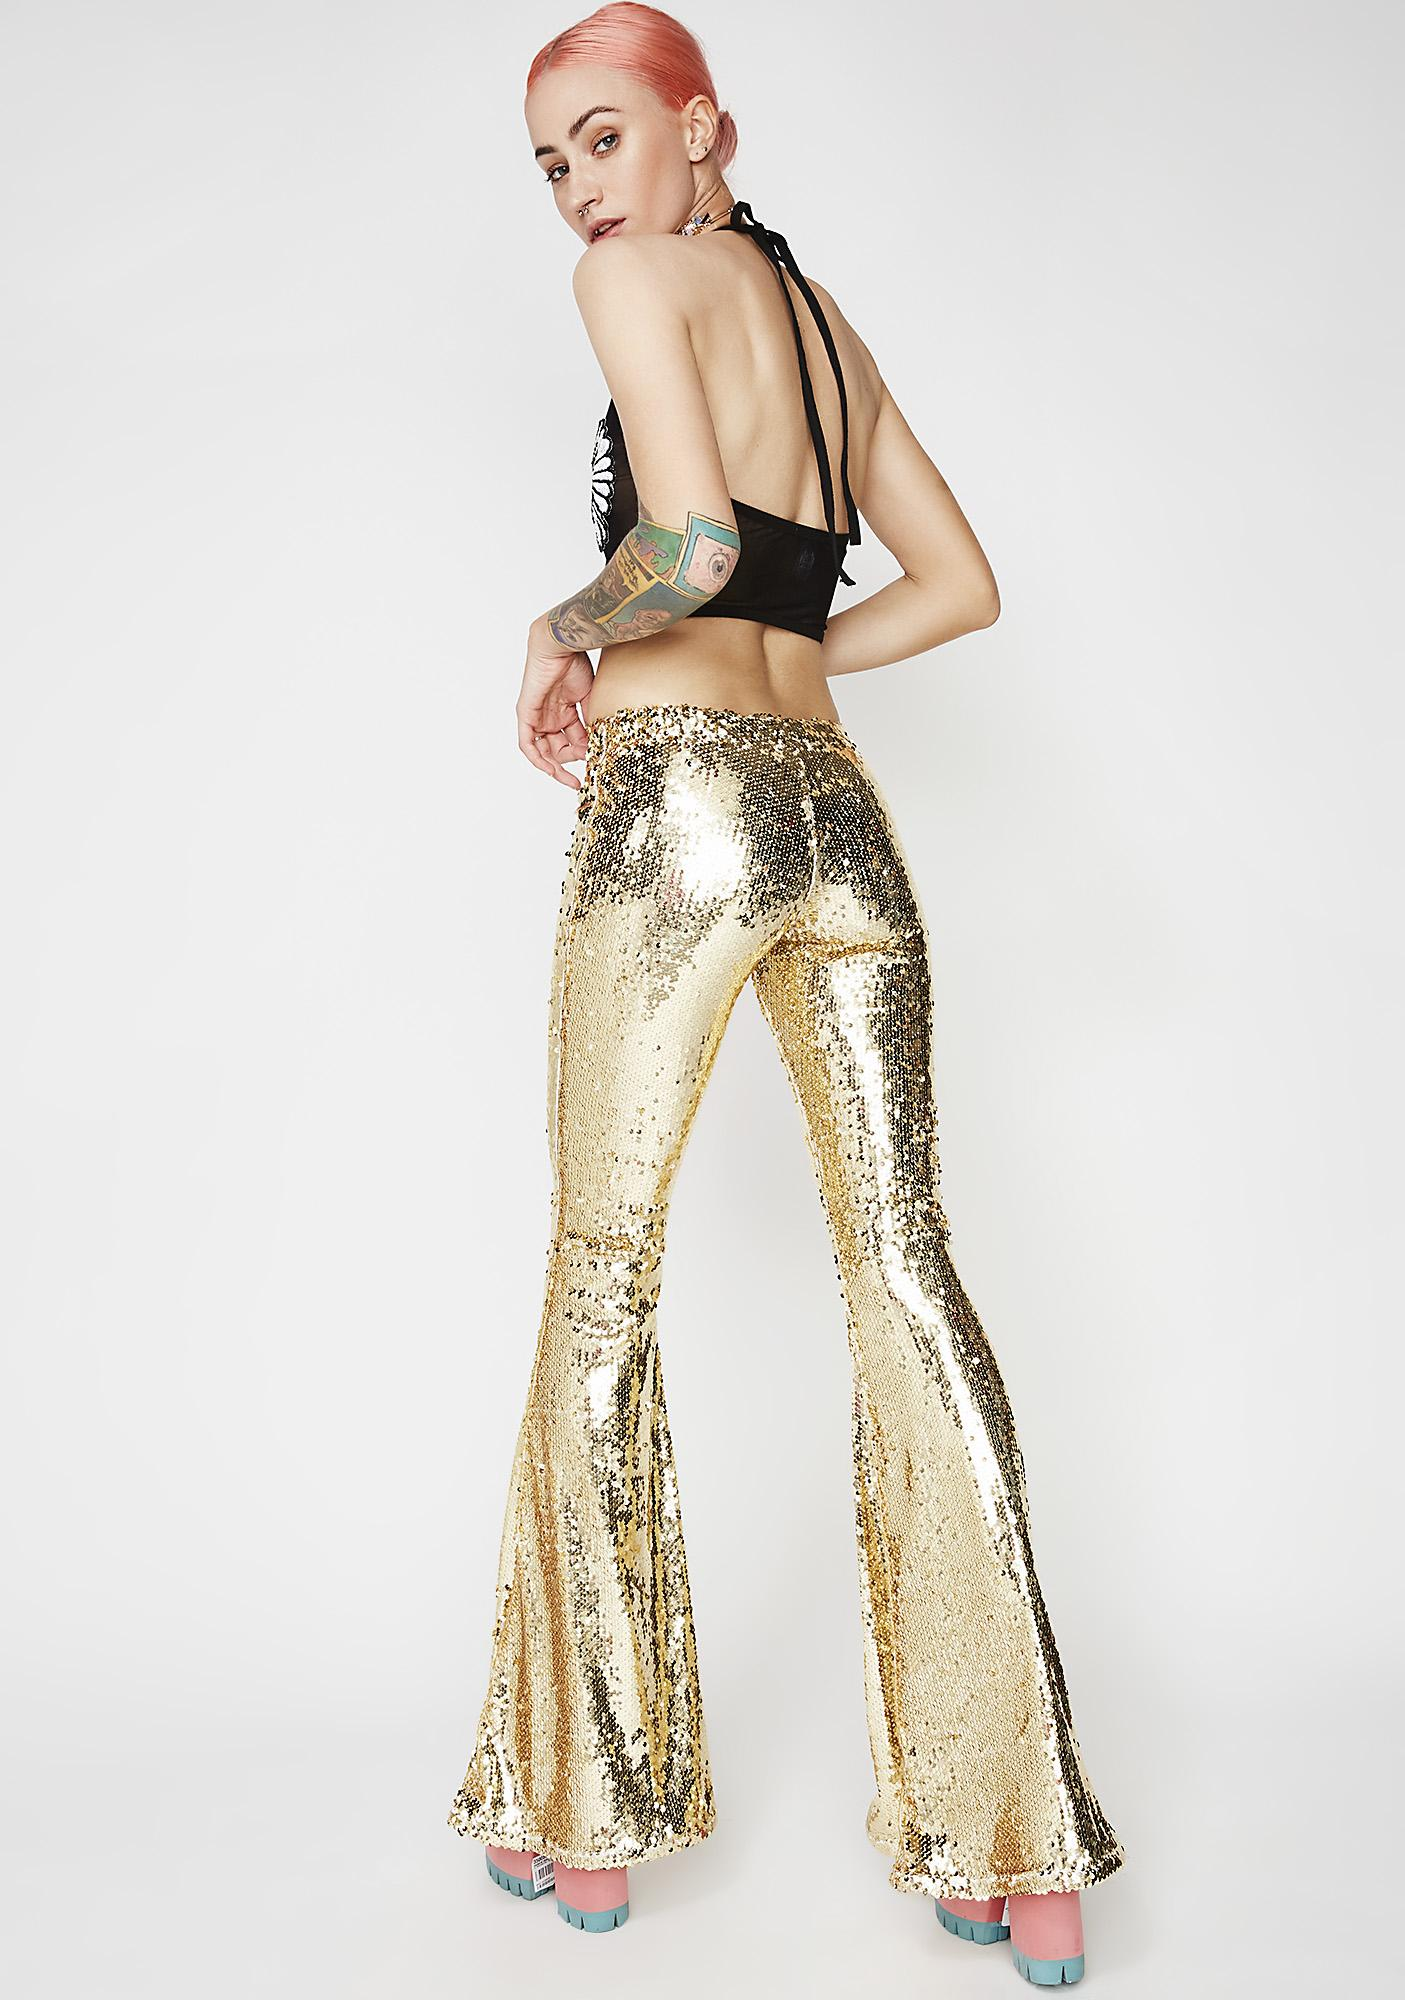 Club Exx Galactic Goddess Gold Bells